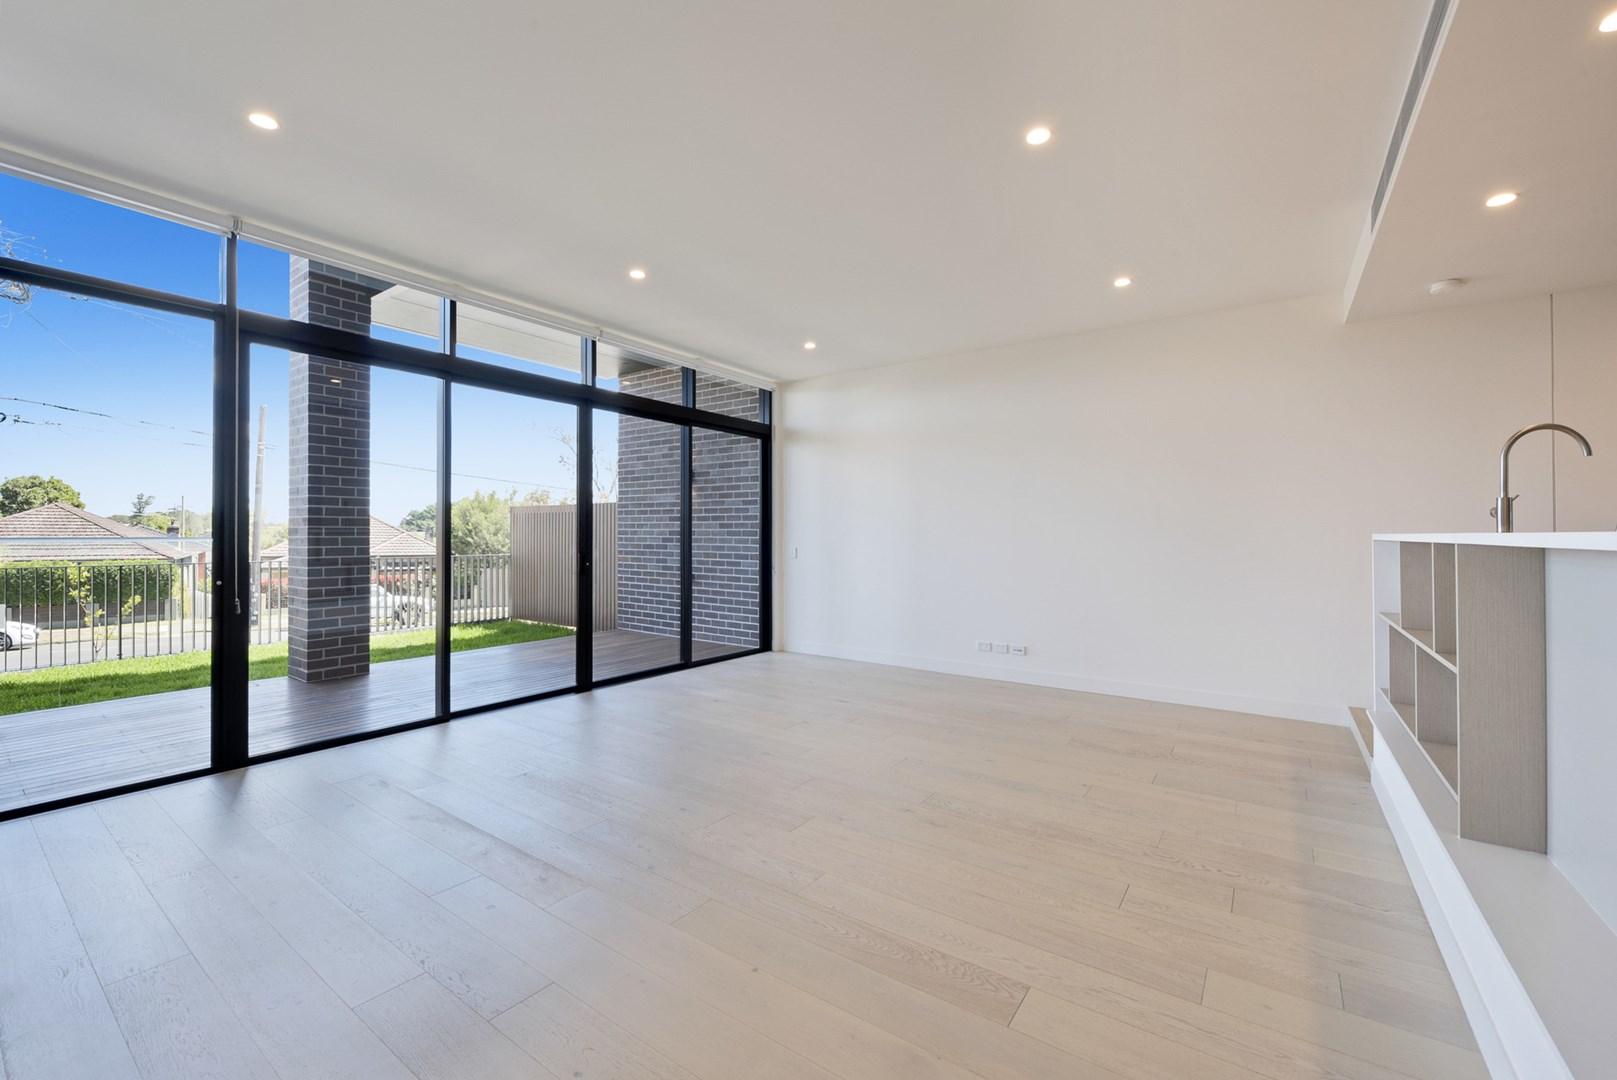 Terrace 10/3 Mckinnon Avenue, Five Dock NSW 2046, Image 0